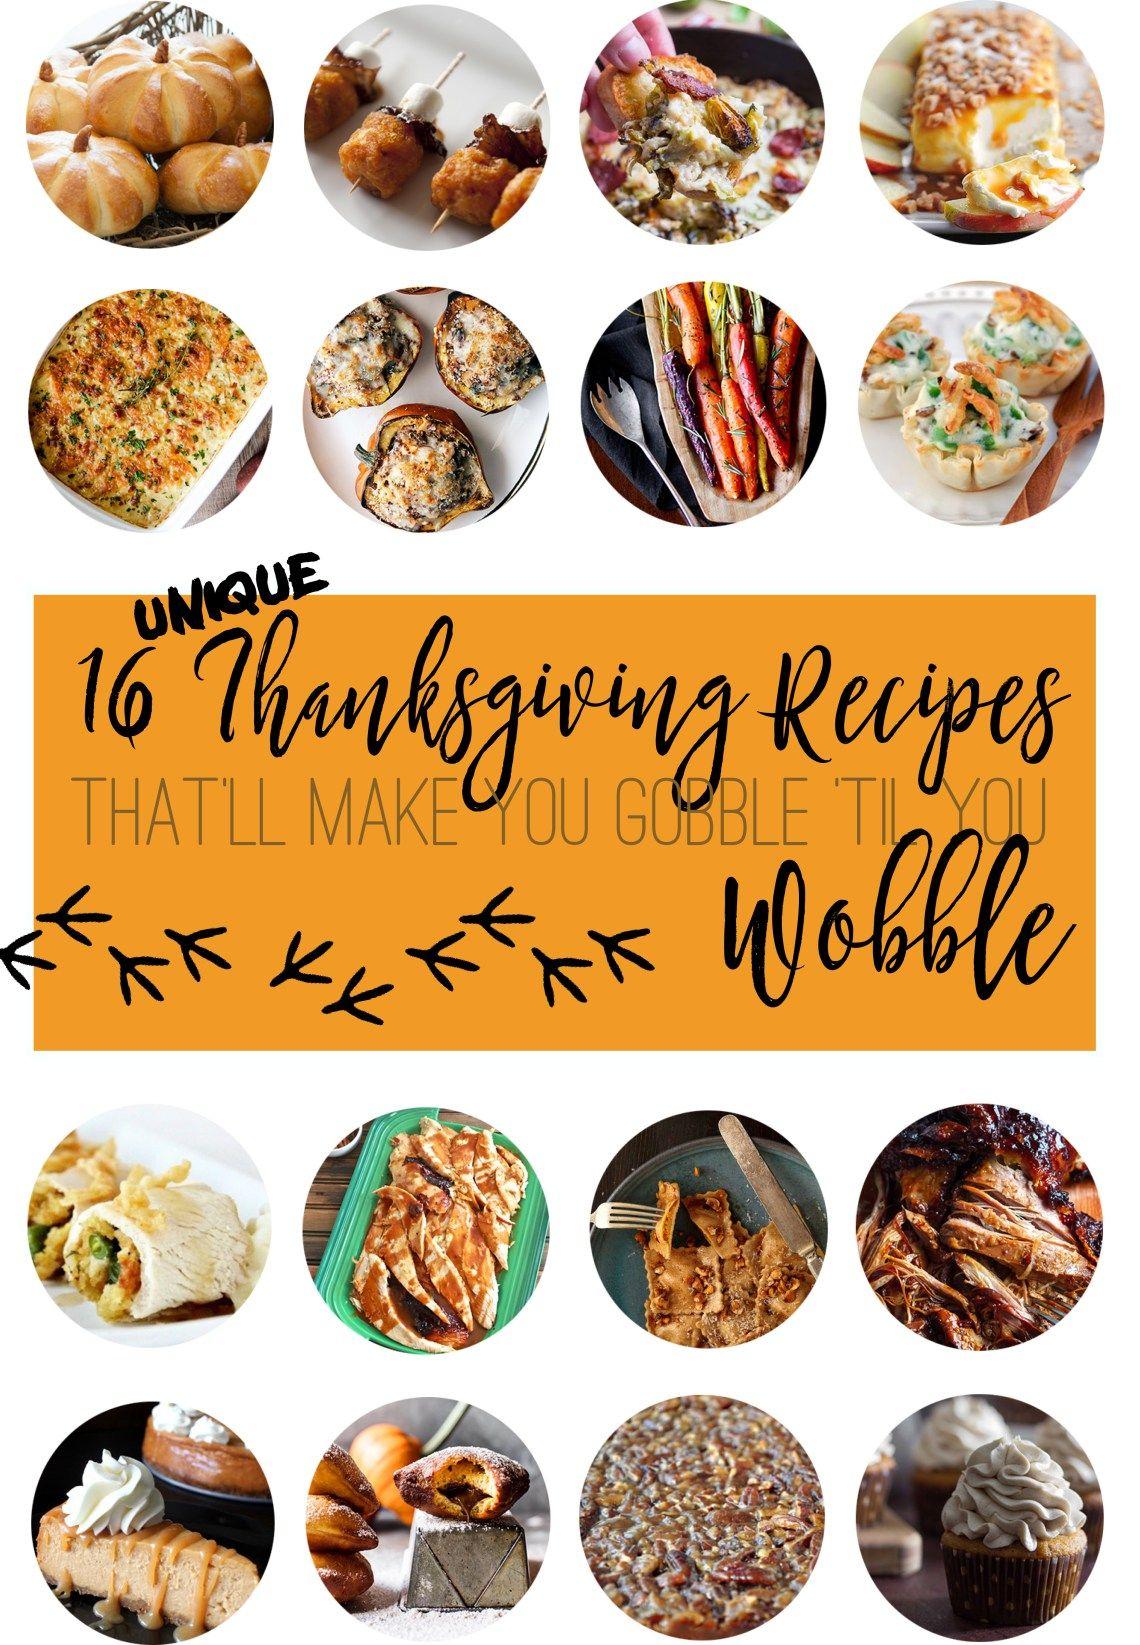 16 Unique Thanksgiving Recipes That Ll Make You Gobble Til You Wobble Unique Thanksgiving Recipes Thanksgiving Appetizers Thanksgiving Recipes